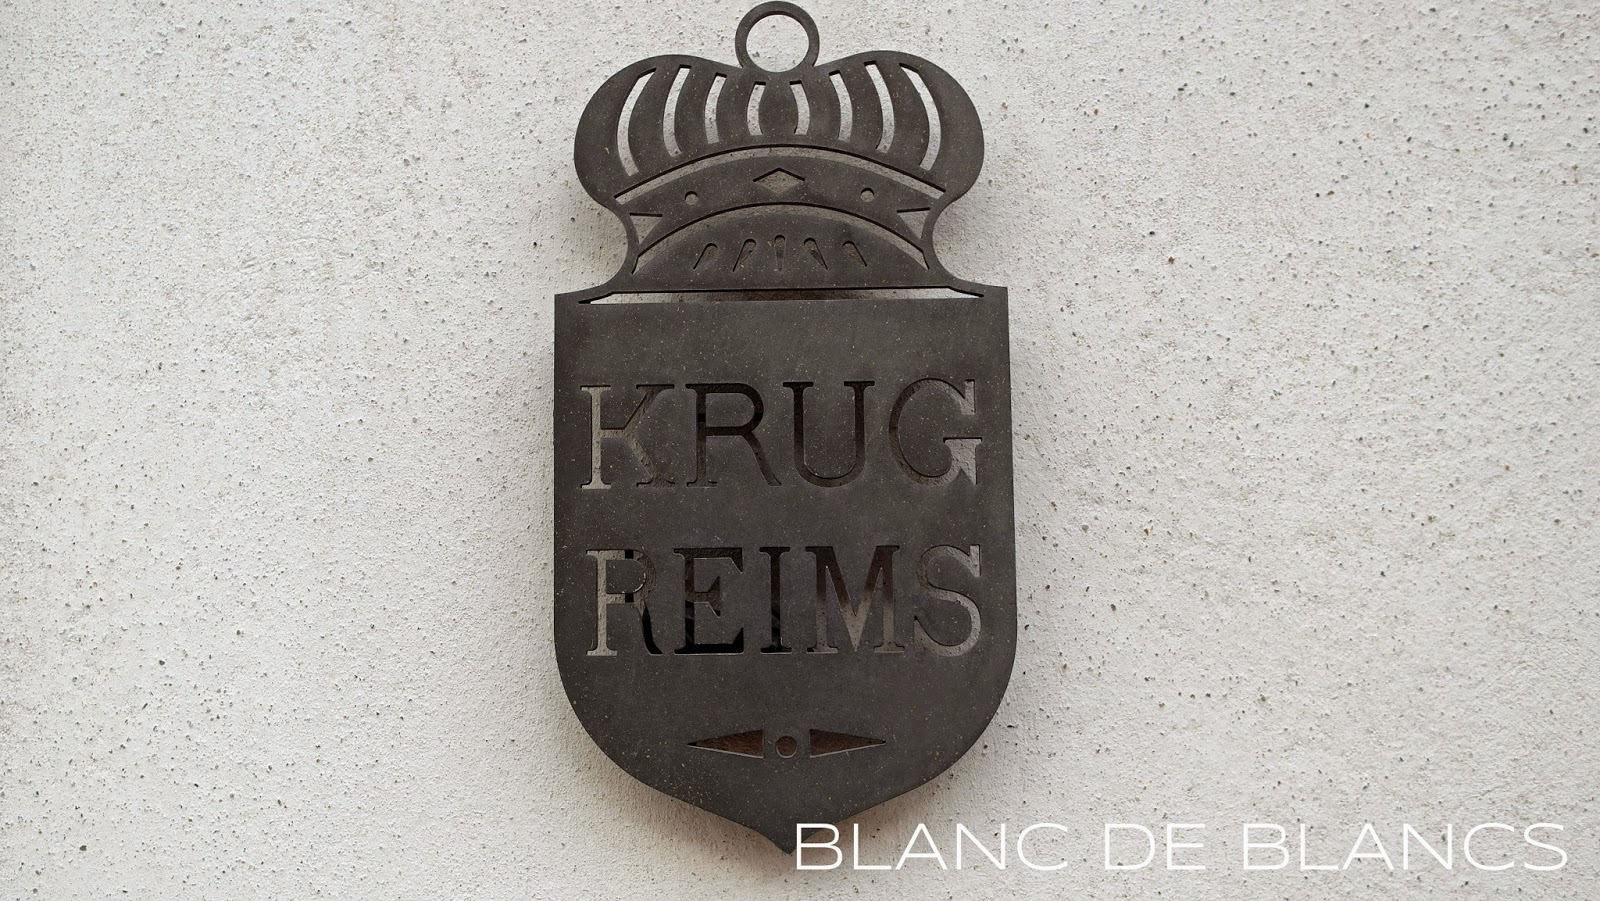 Krug Reims - www.blancdeblancs.fi